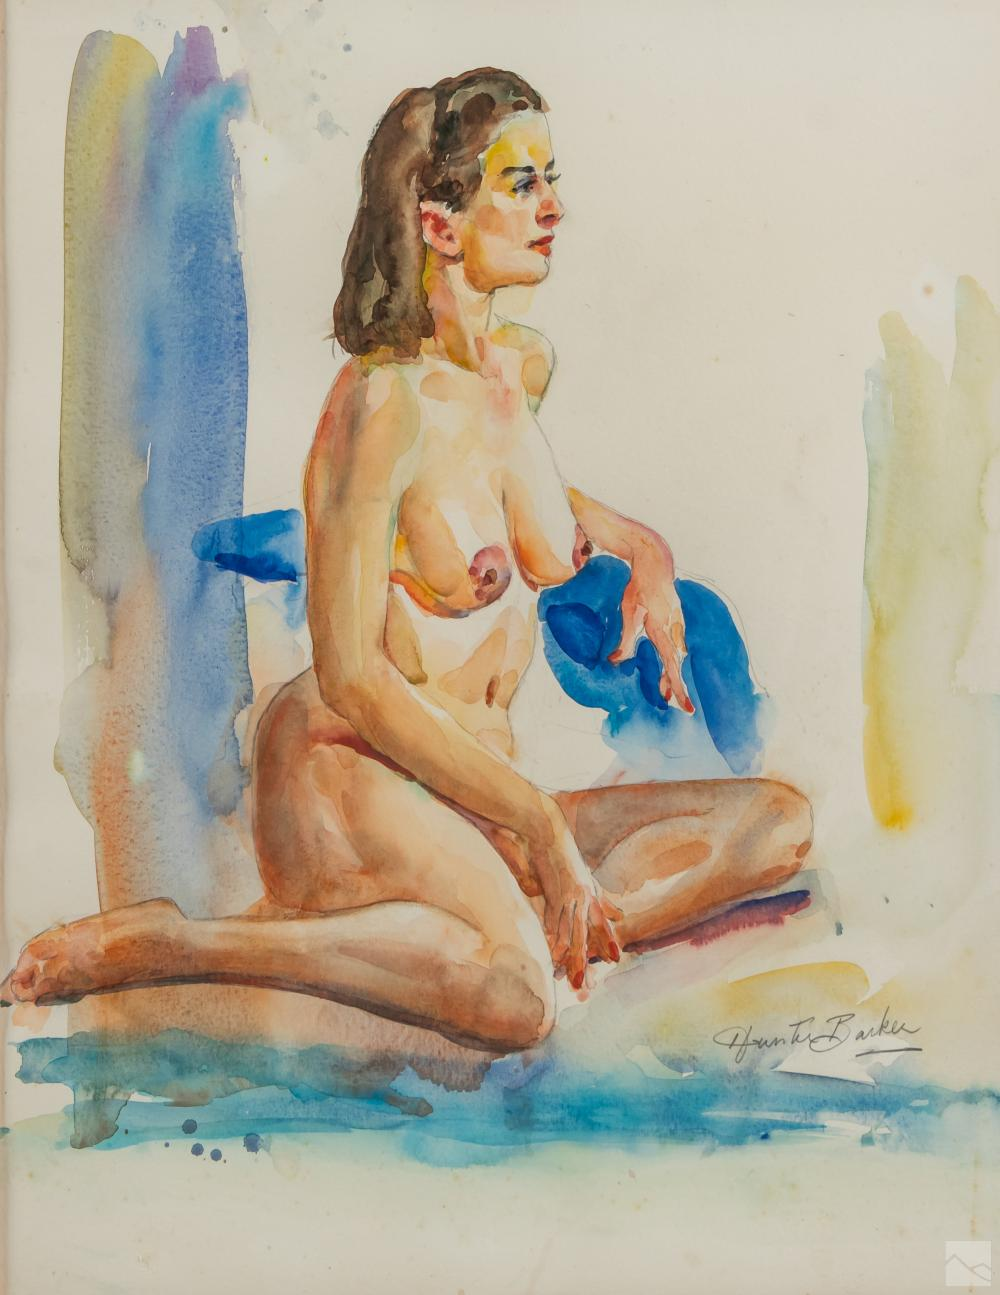 Hunter Barker (1918-2010) Nude Watercolor Painting